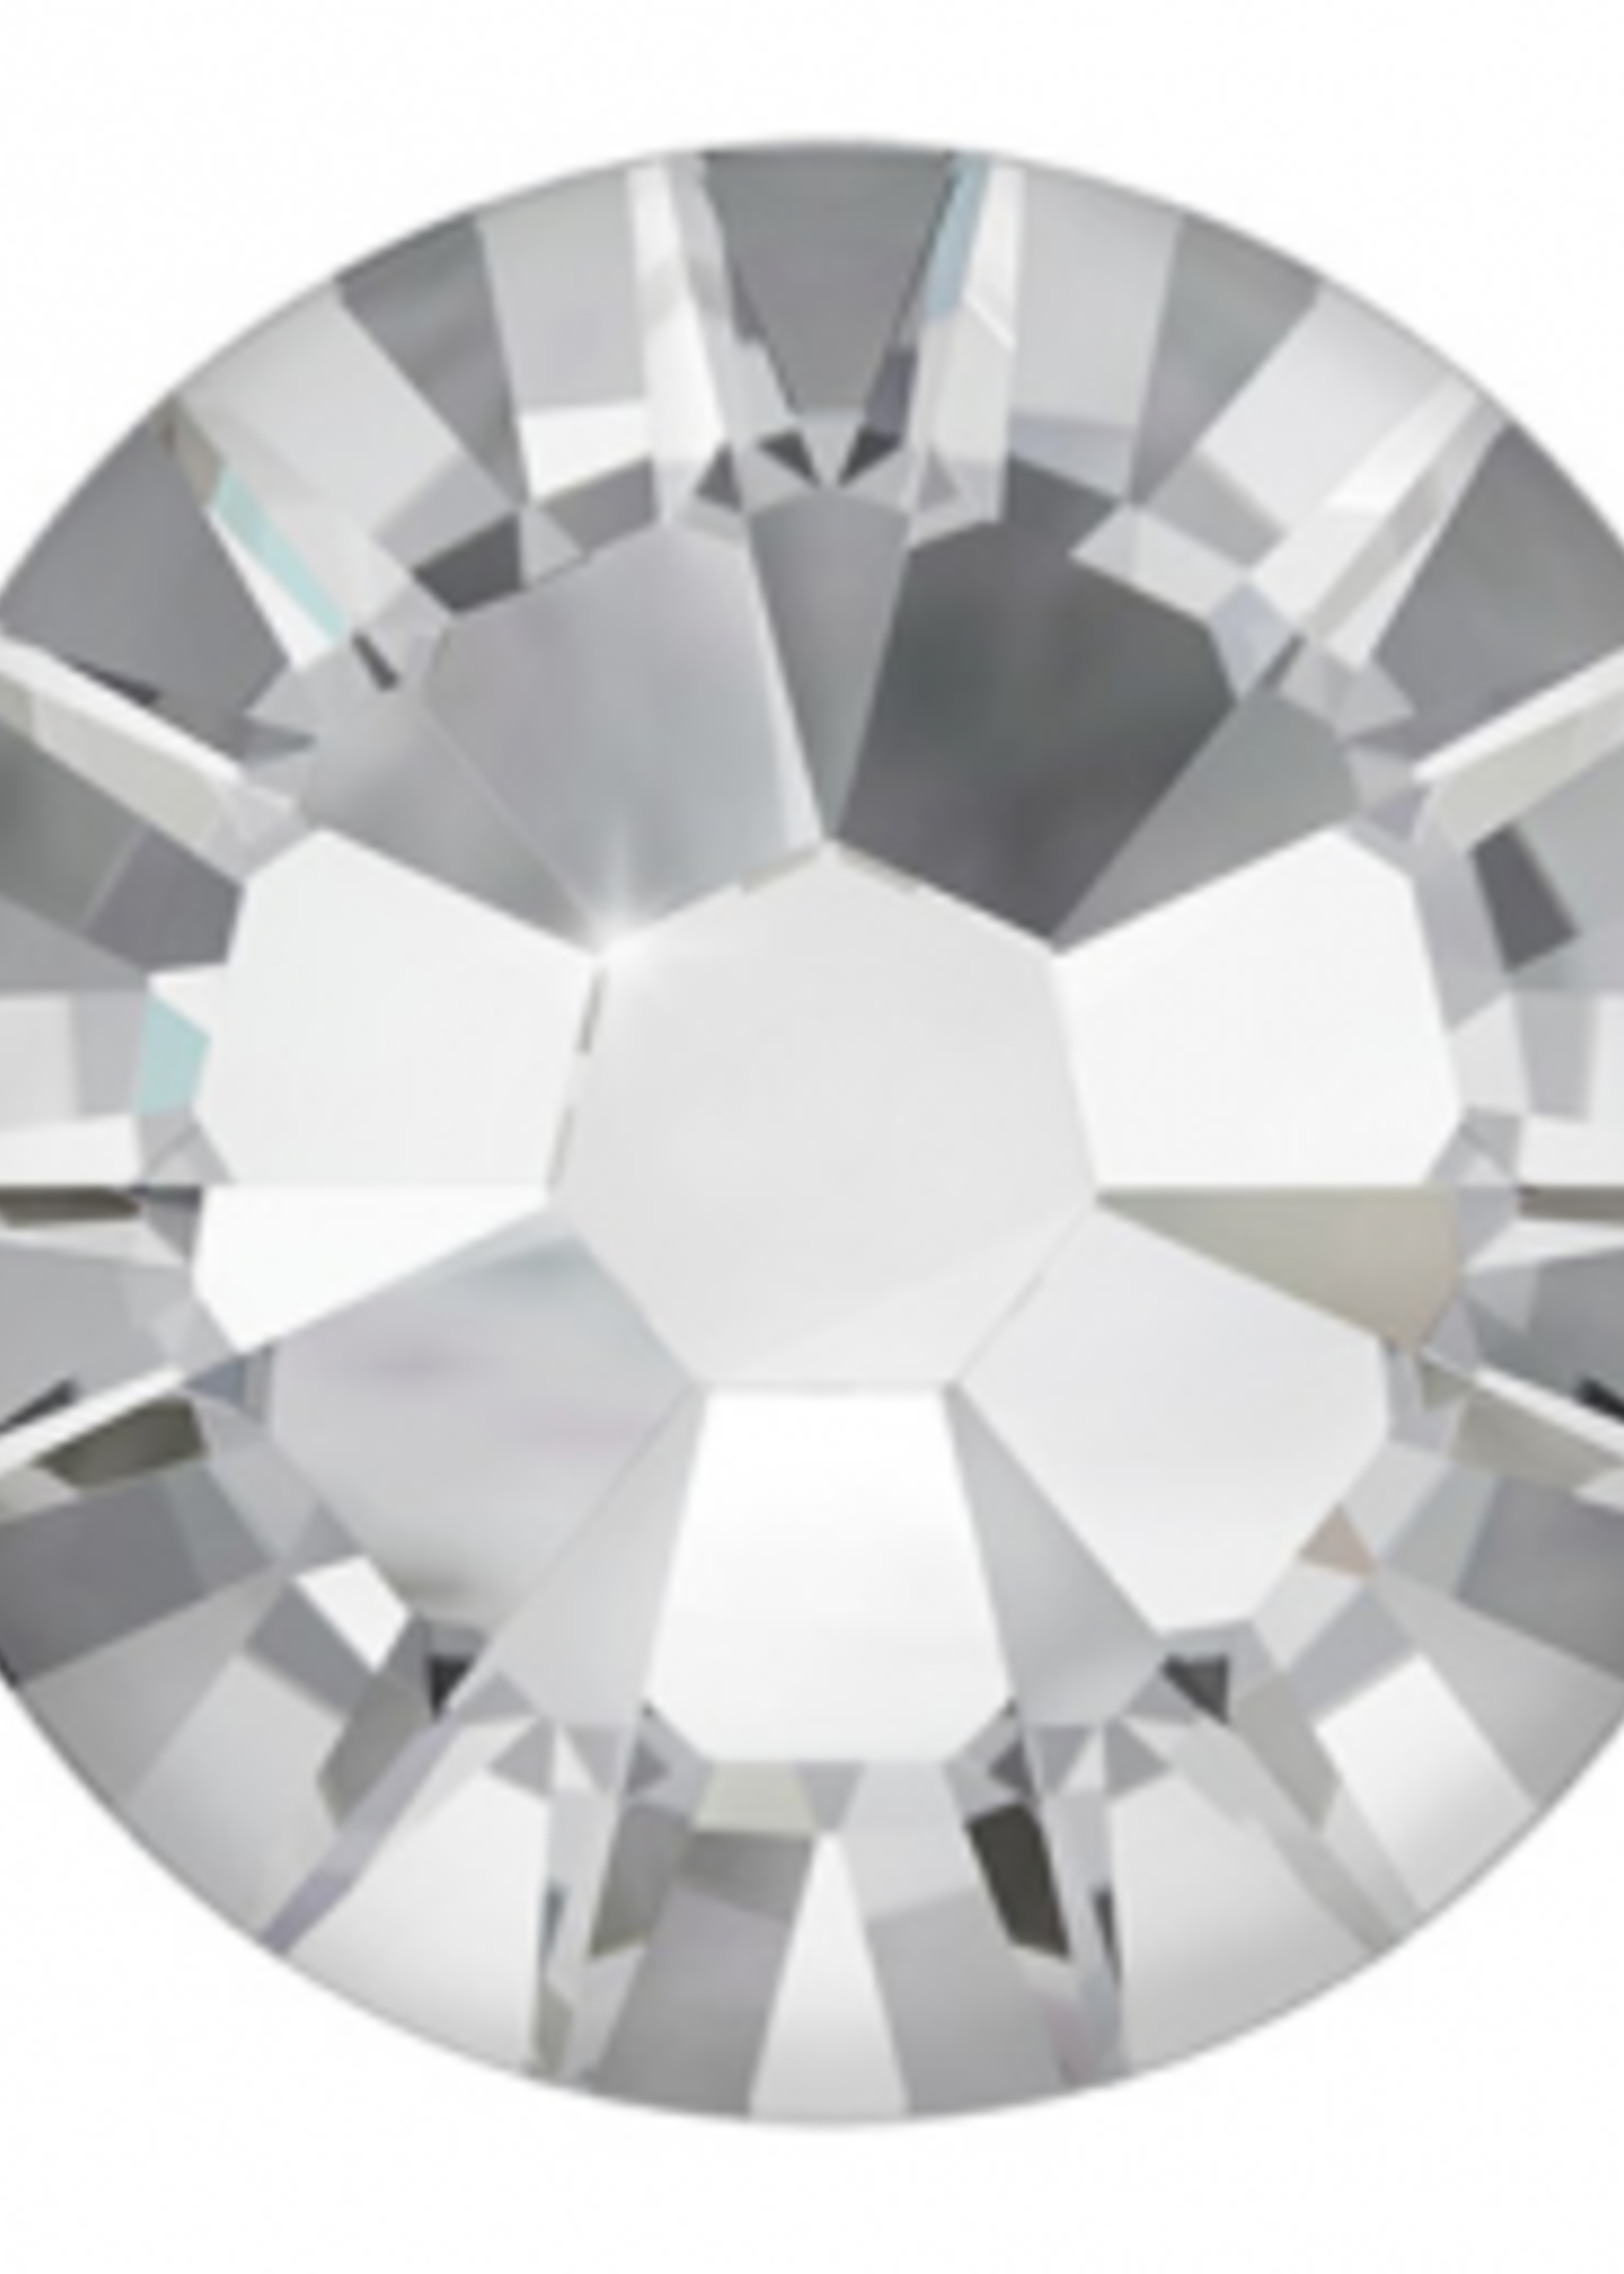 Swarovski Swarovski Crystal Silver 2.15 mm